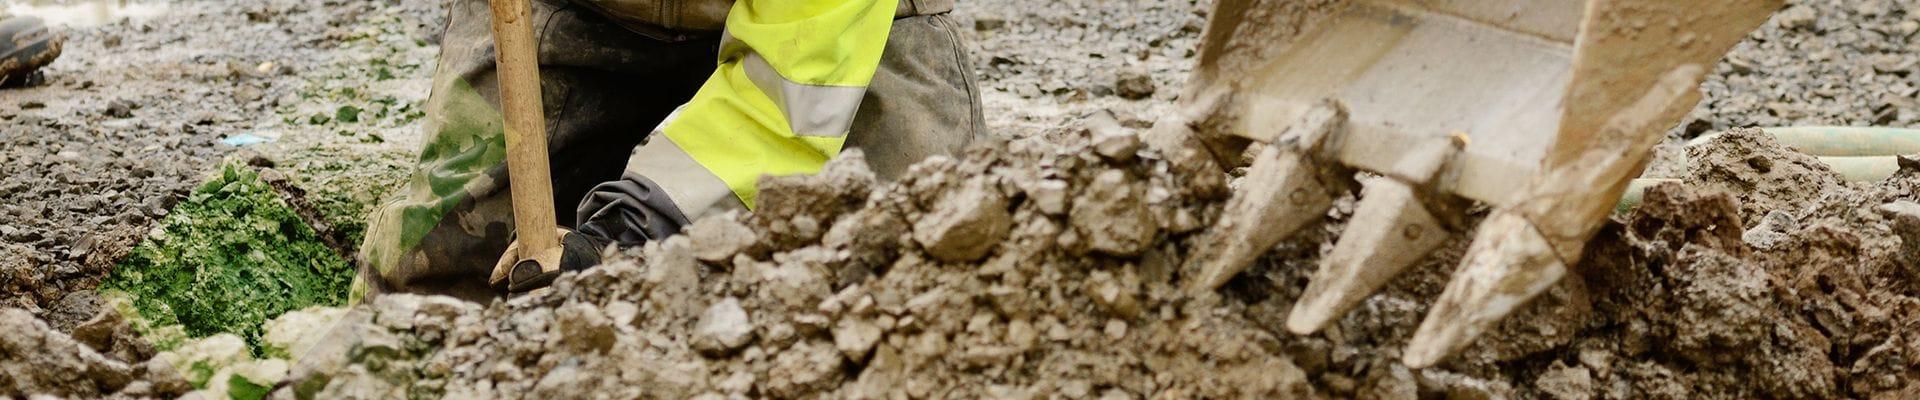 ground disturbance and trench safety training